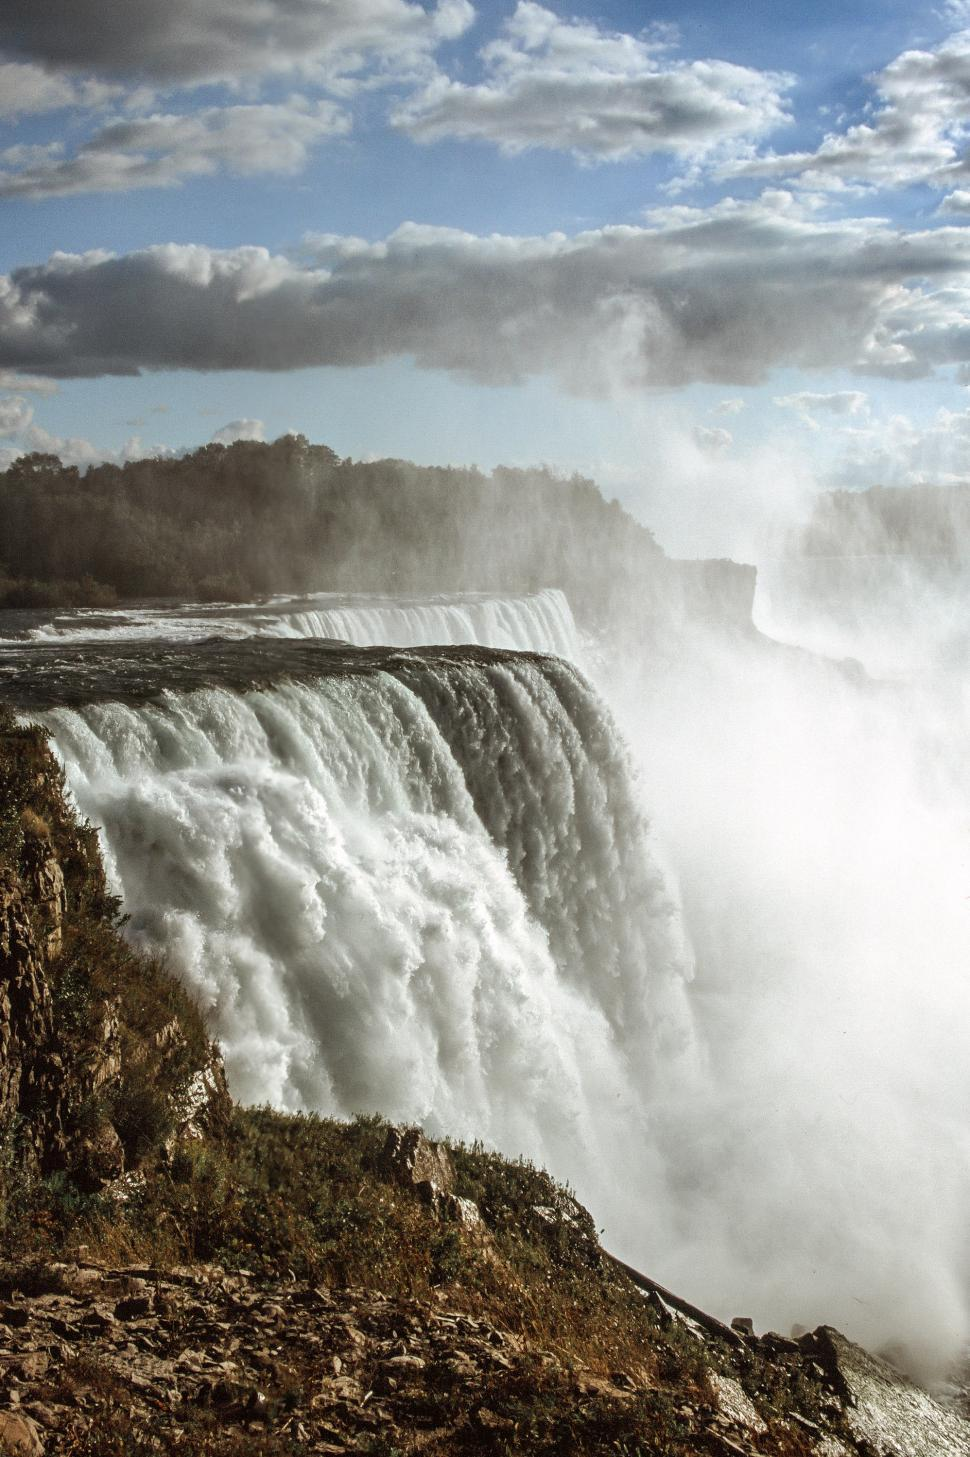 Download Free Stock HD Photo of American Falls at Niagara Falls Online